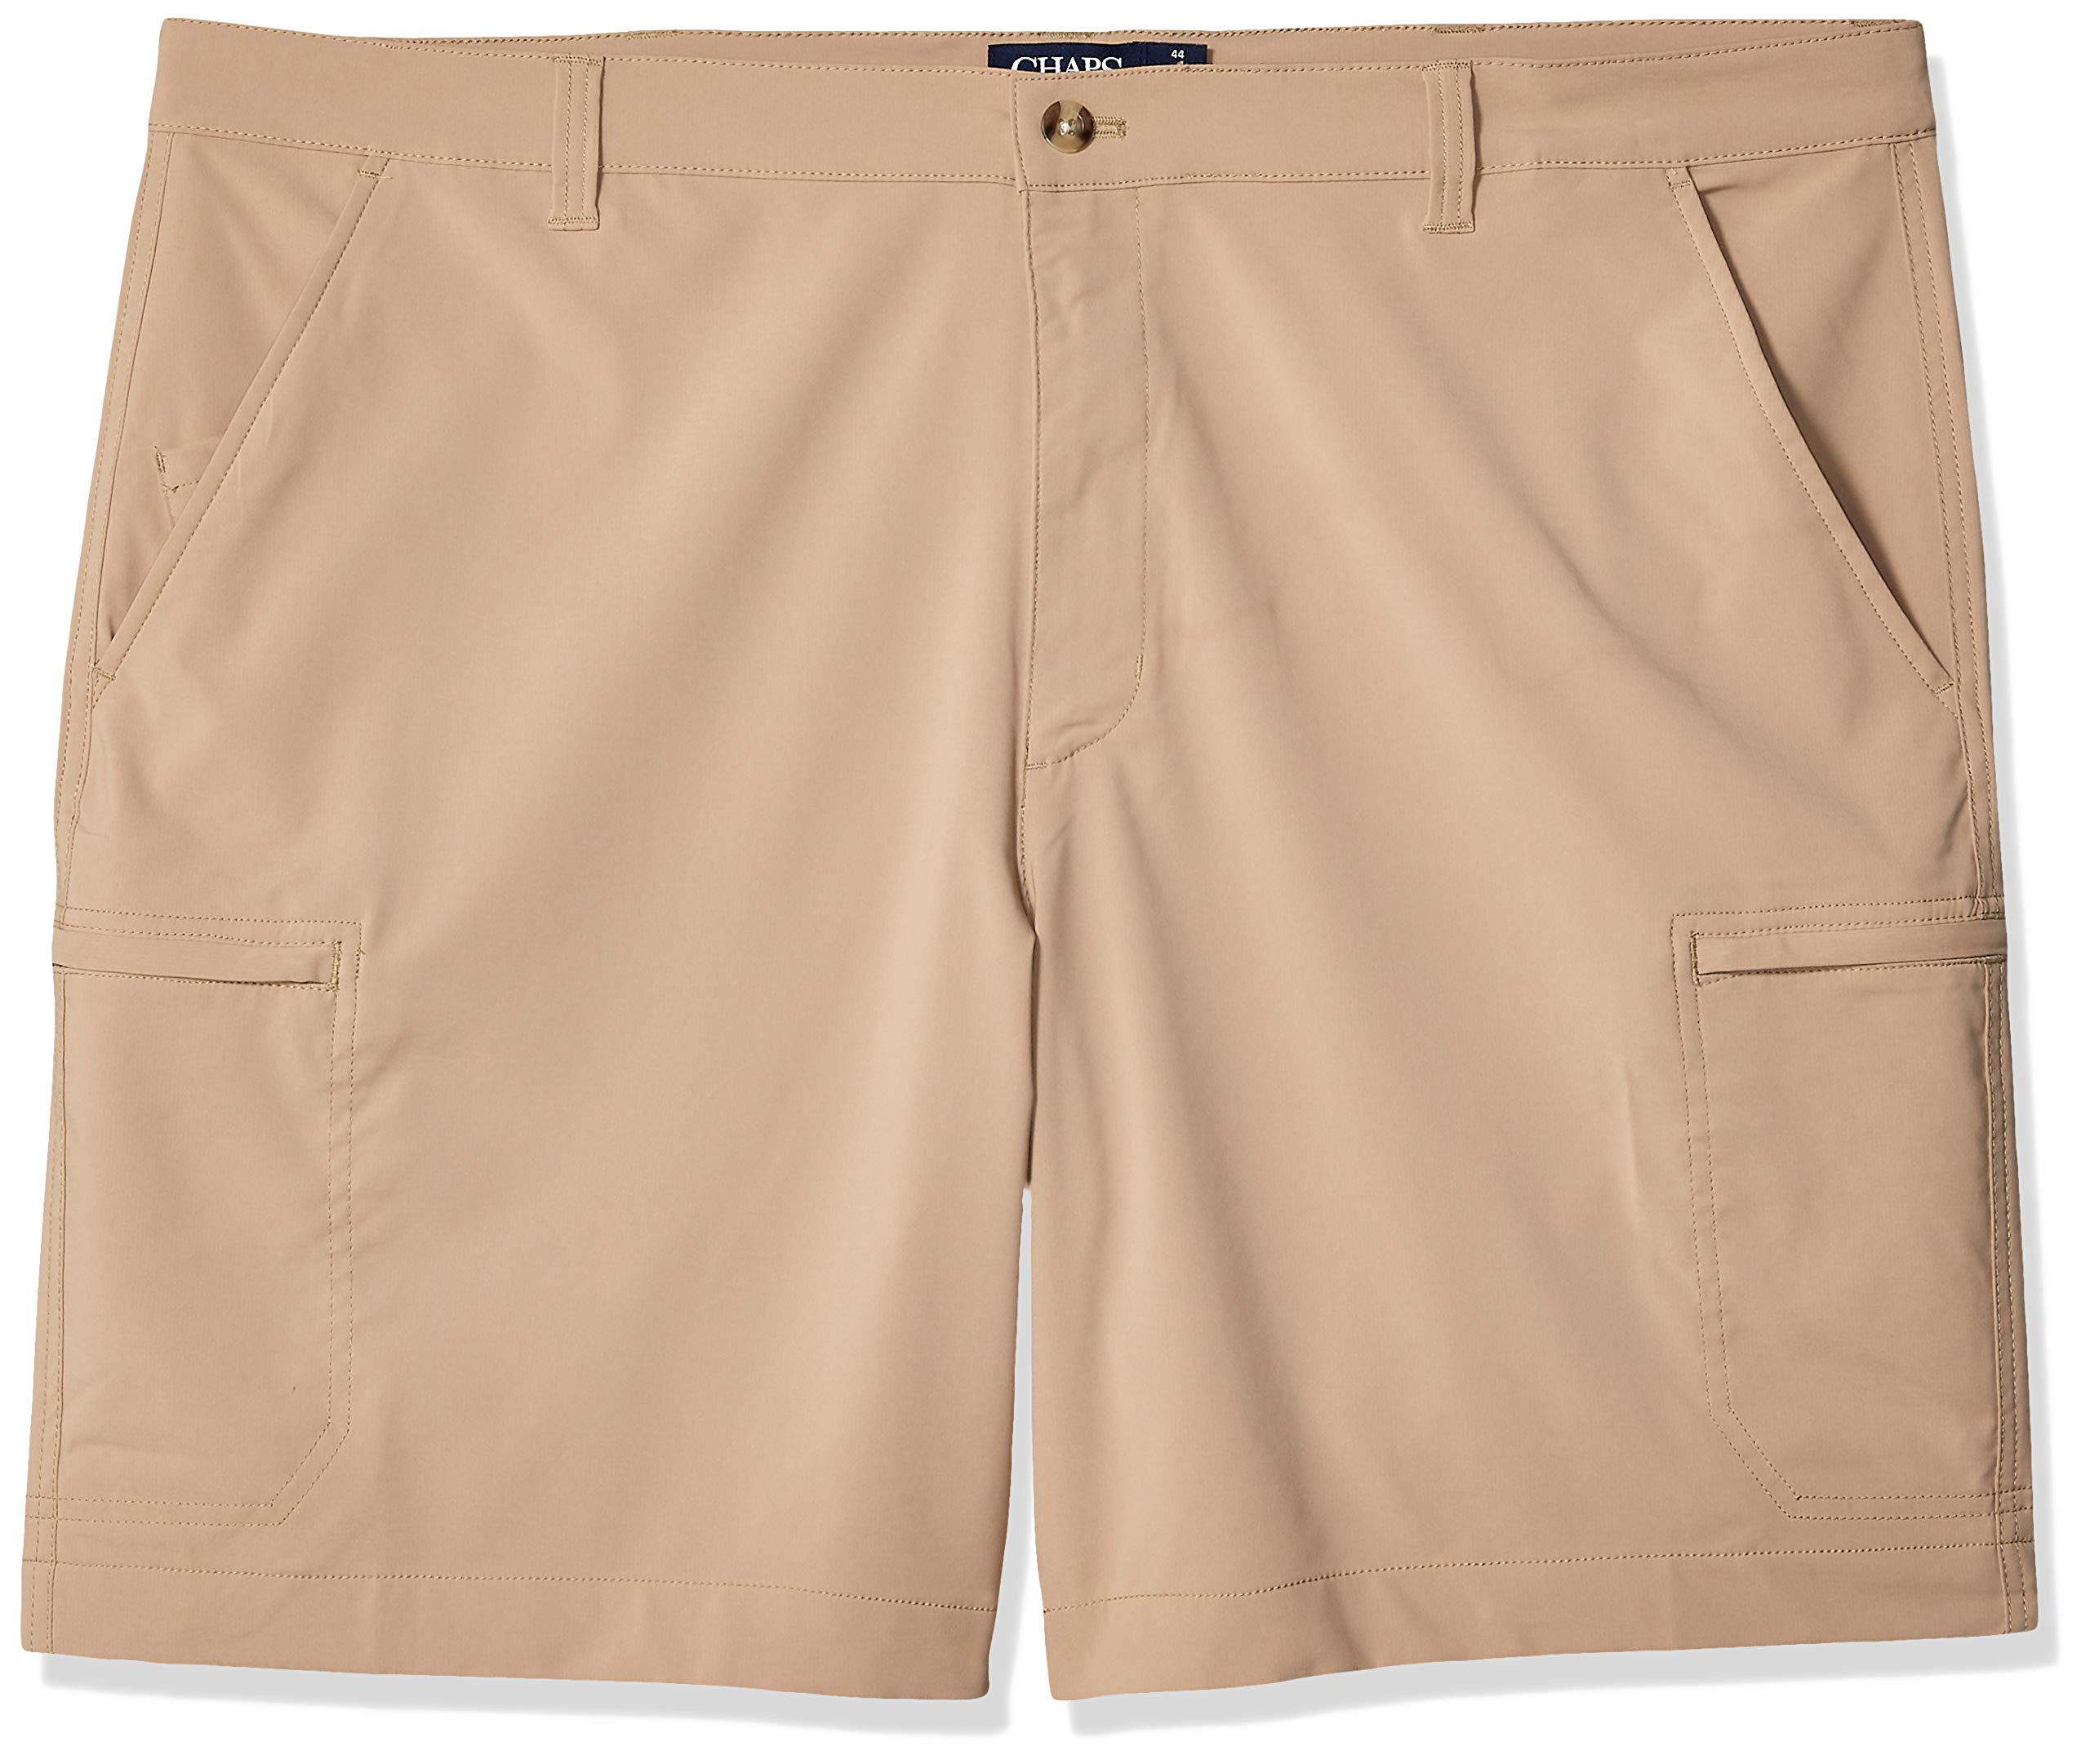 Chaps Men's Big and Tall Performance Cargo Short, Crawford tan, 44B